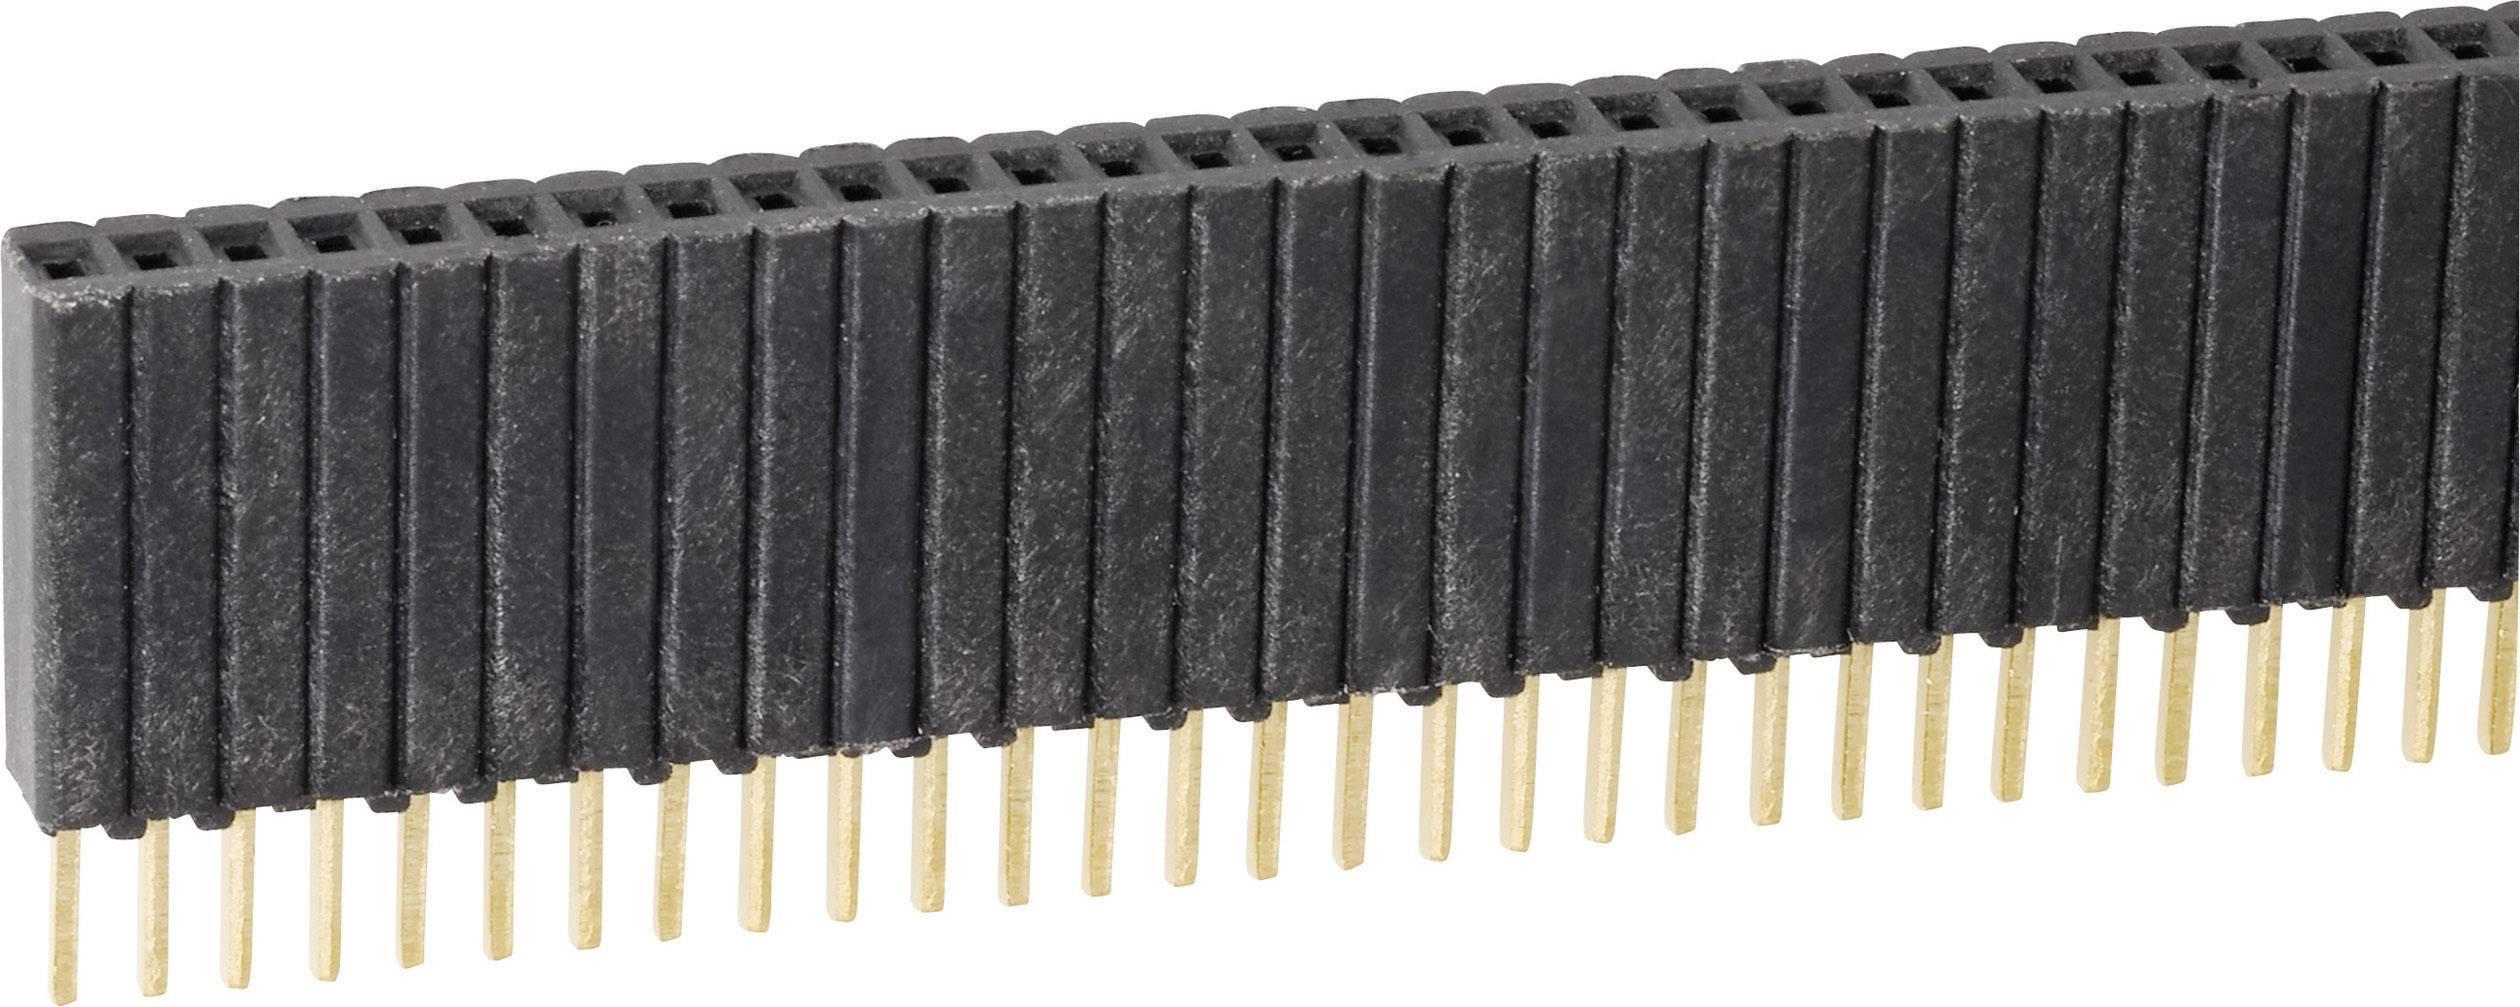 Zásuvková lišta Fischer Elektronik BLM KG 1/ 36/G, řádky 1, kontakty na řádek 36, 1 ks